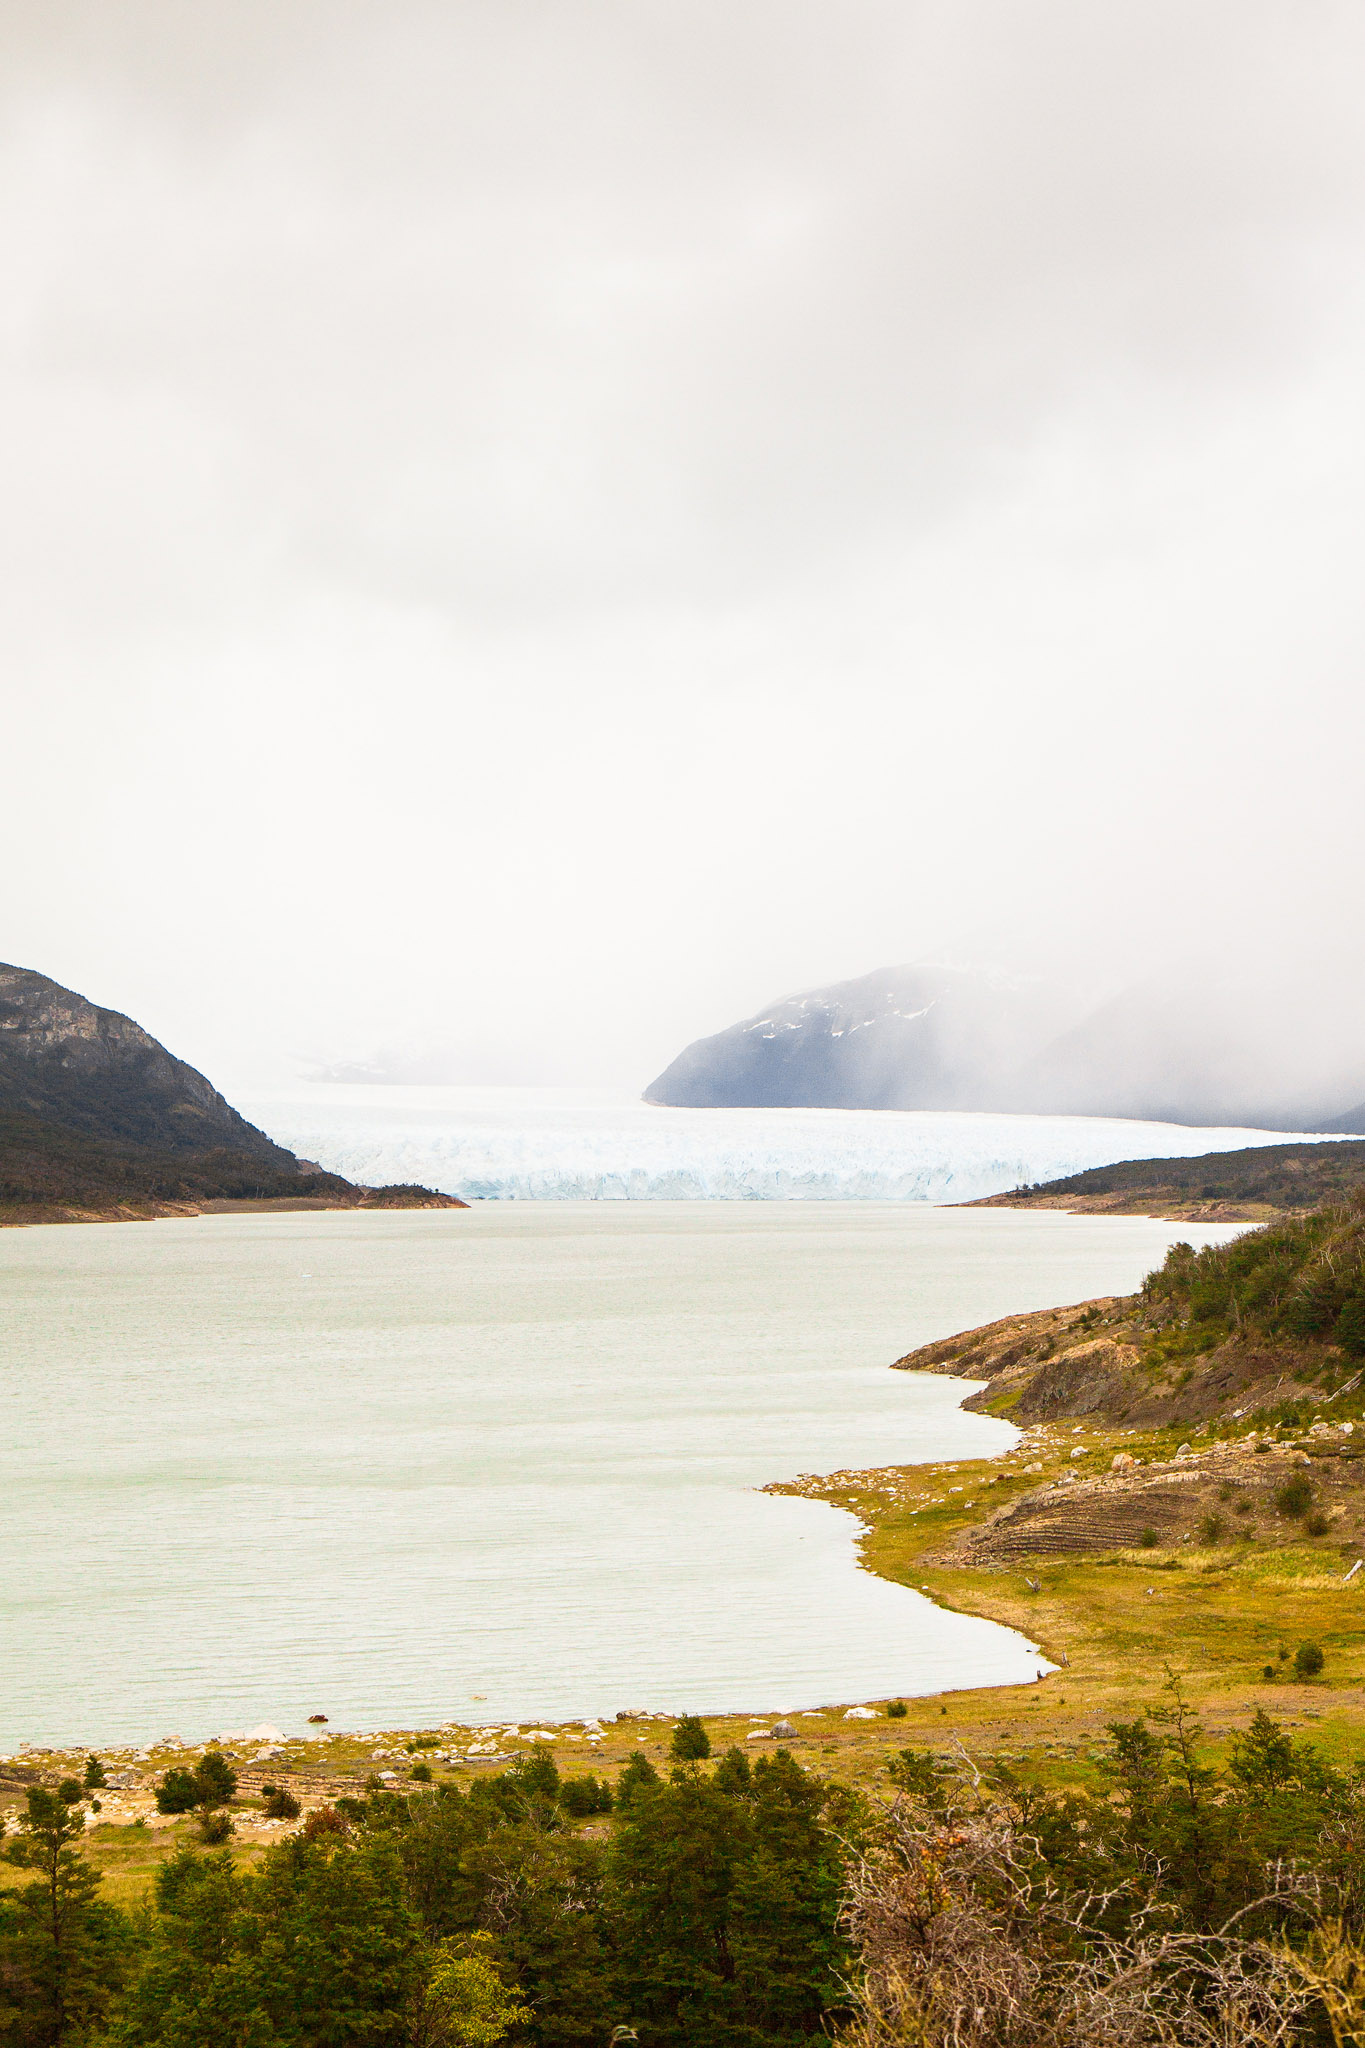 Wedding-Travellers-Overlanding-Destination-Wedding-Chile-Patagonia-Glacier-Perito-Moreno